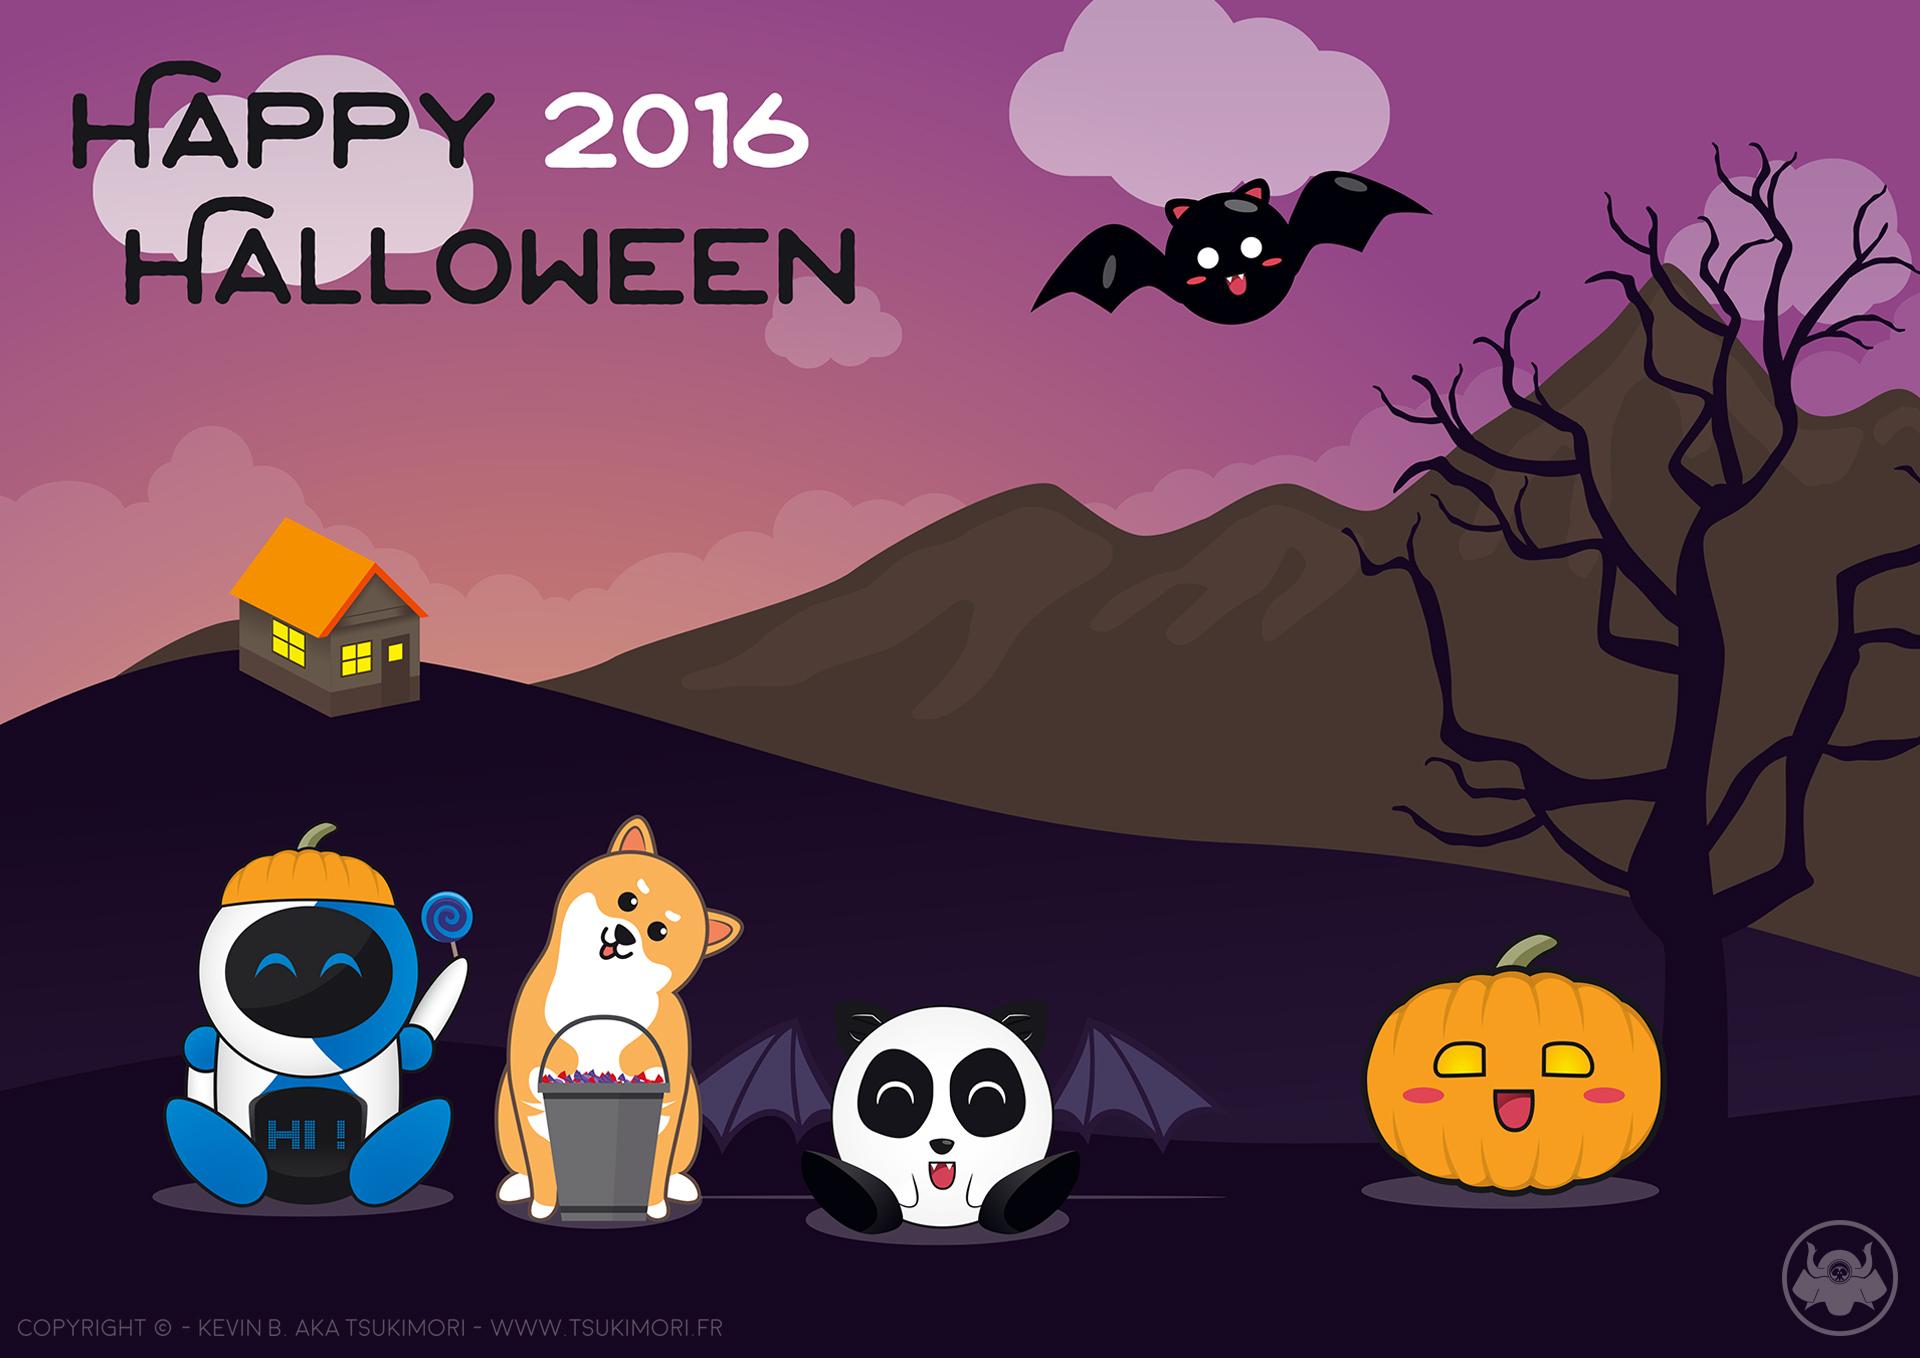 Joyeux Halloween 2015 - Featured